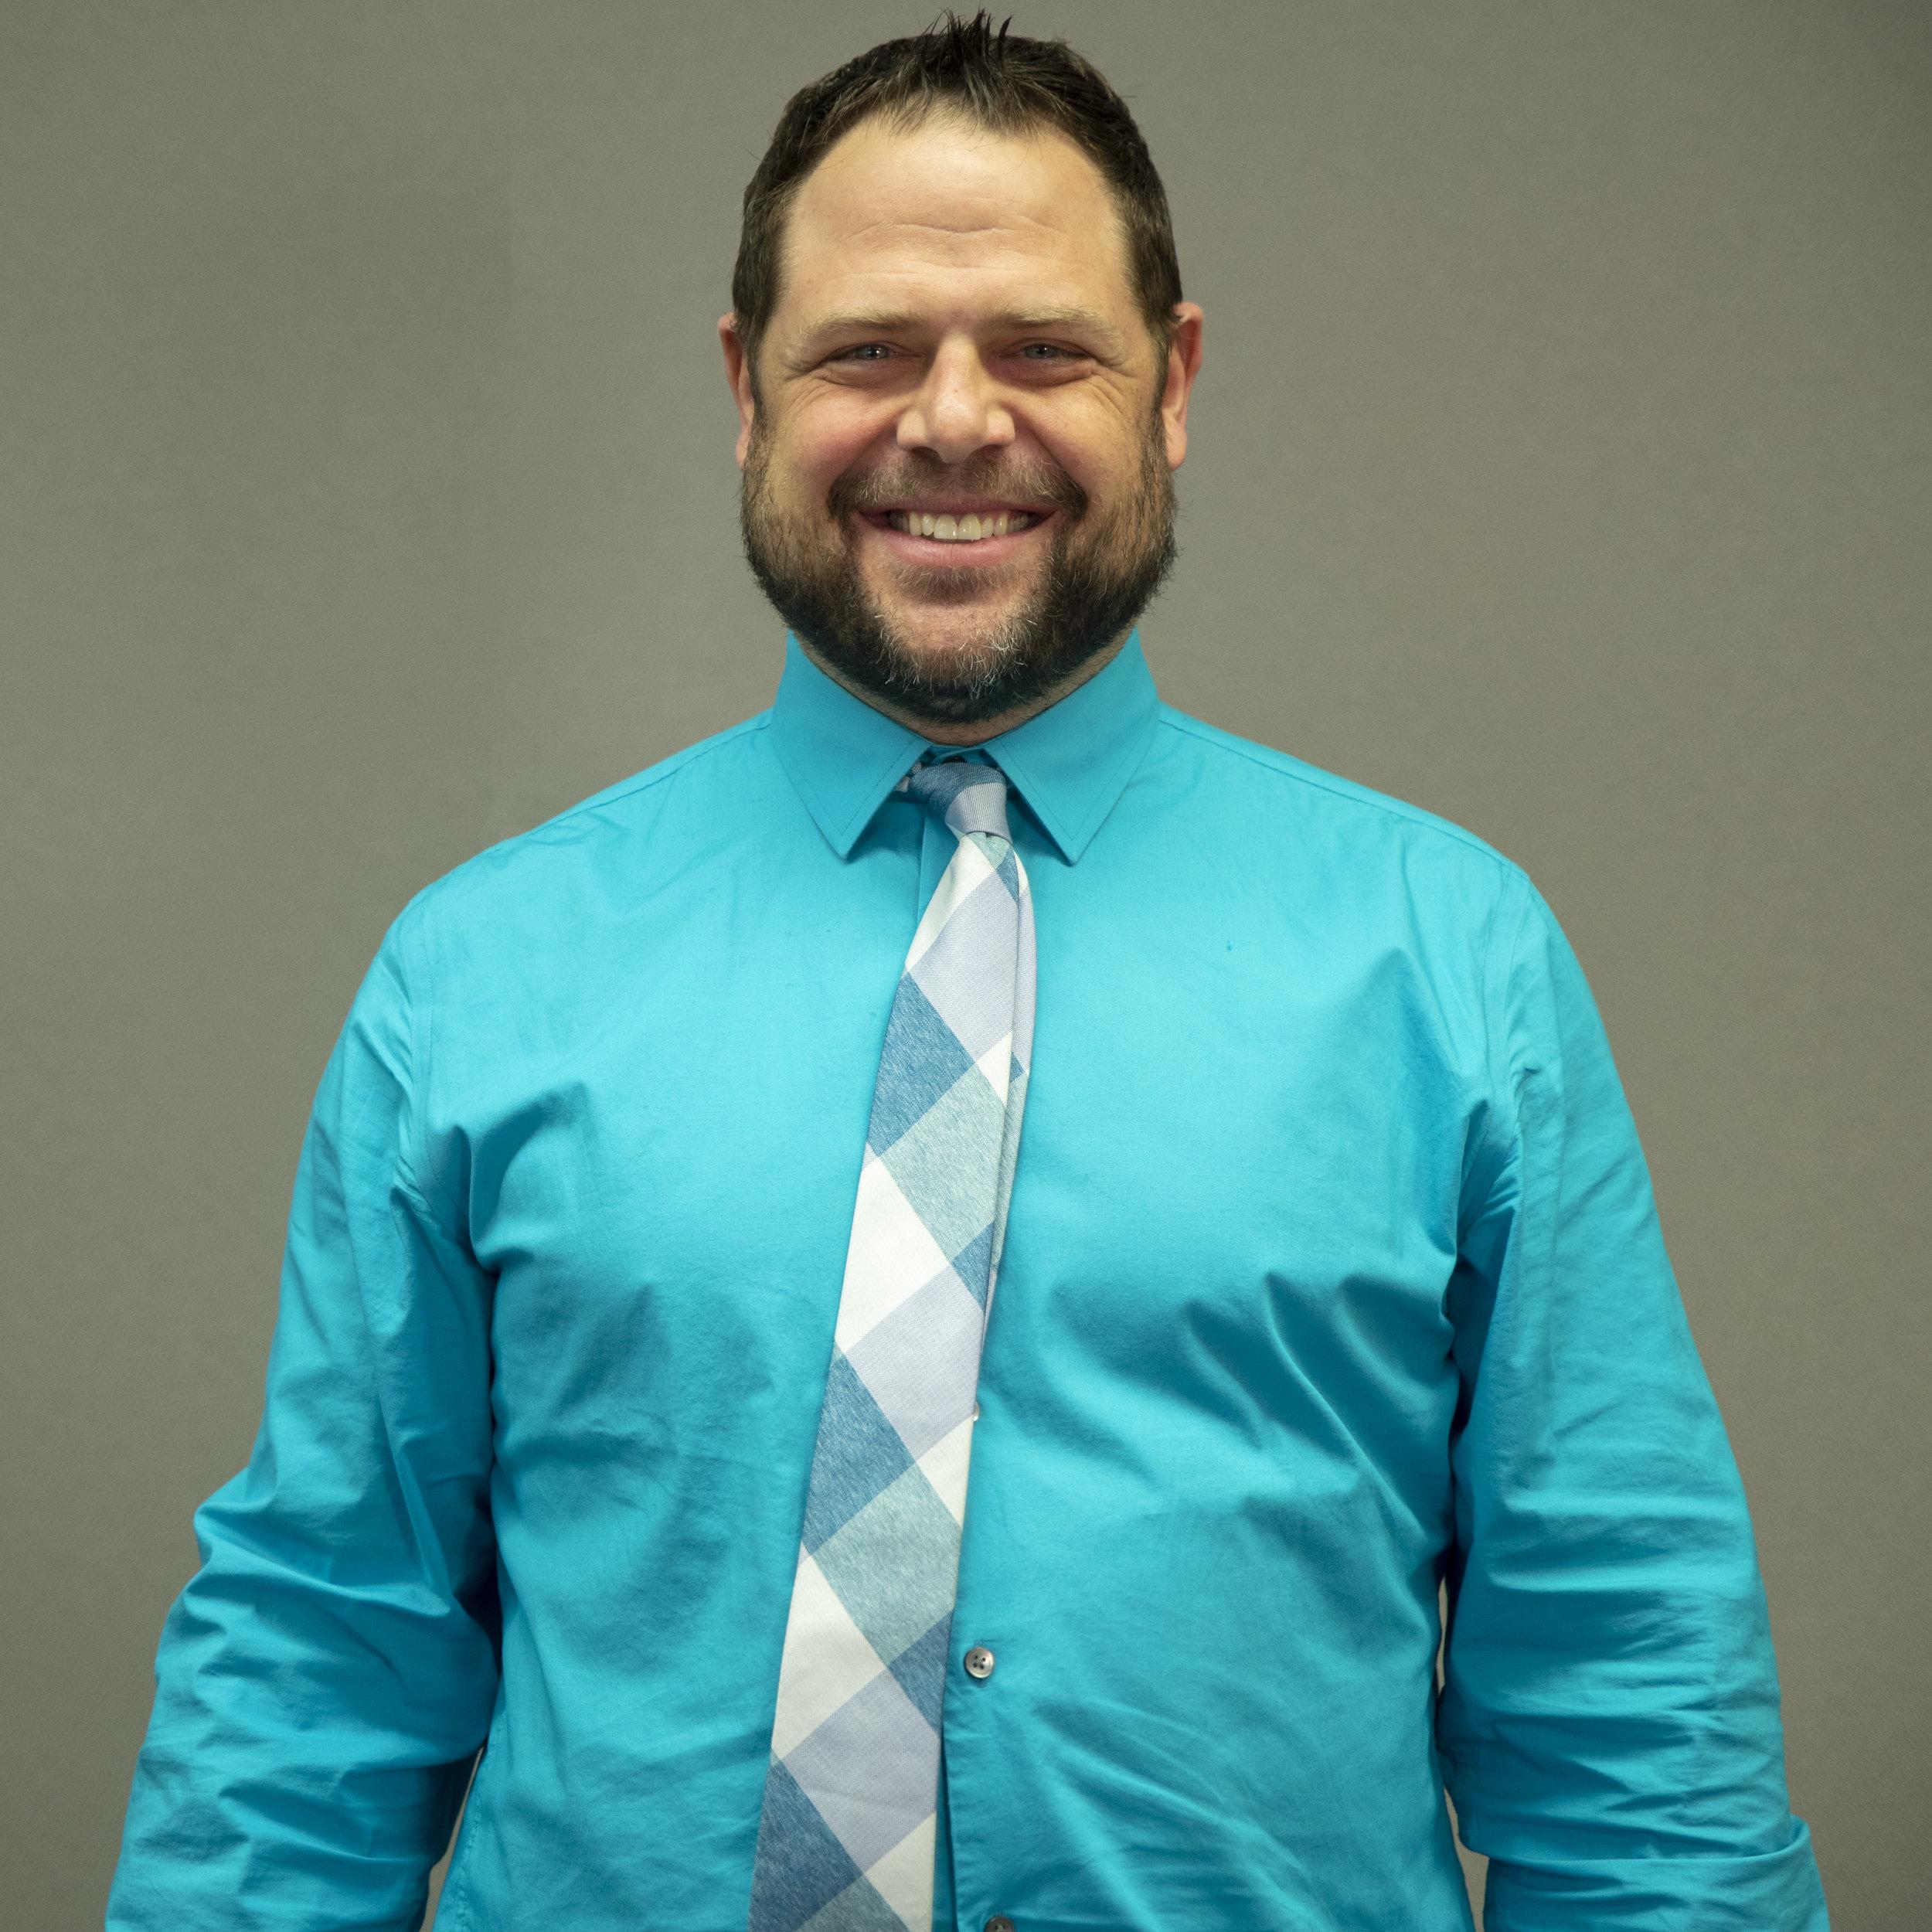 David Ondersma - English Instructordondersma@chayvs.org